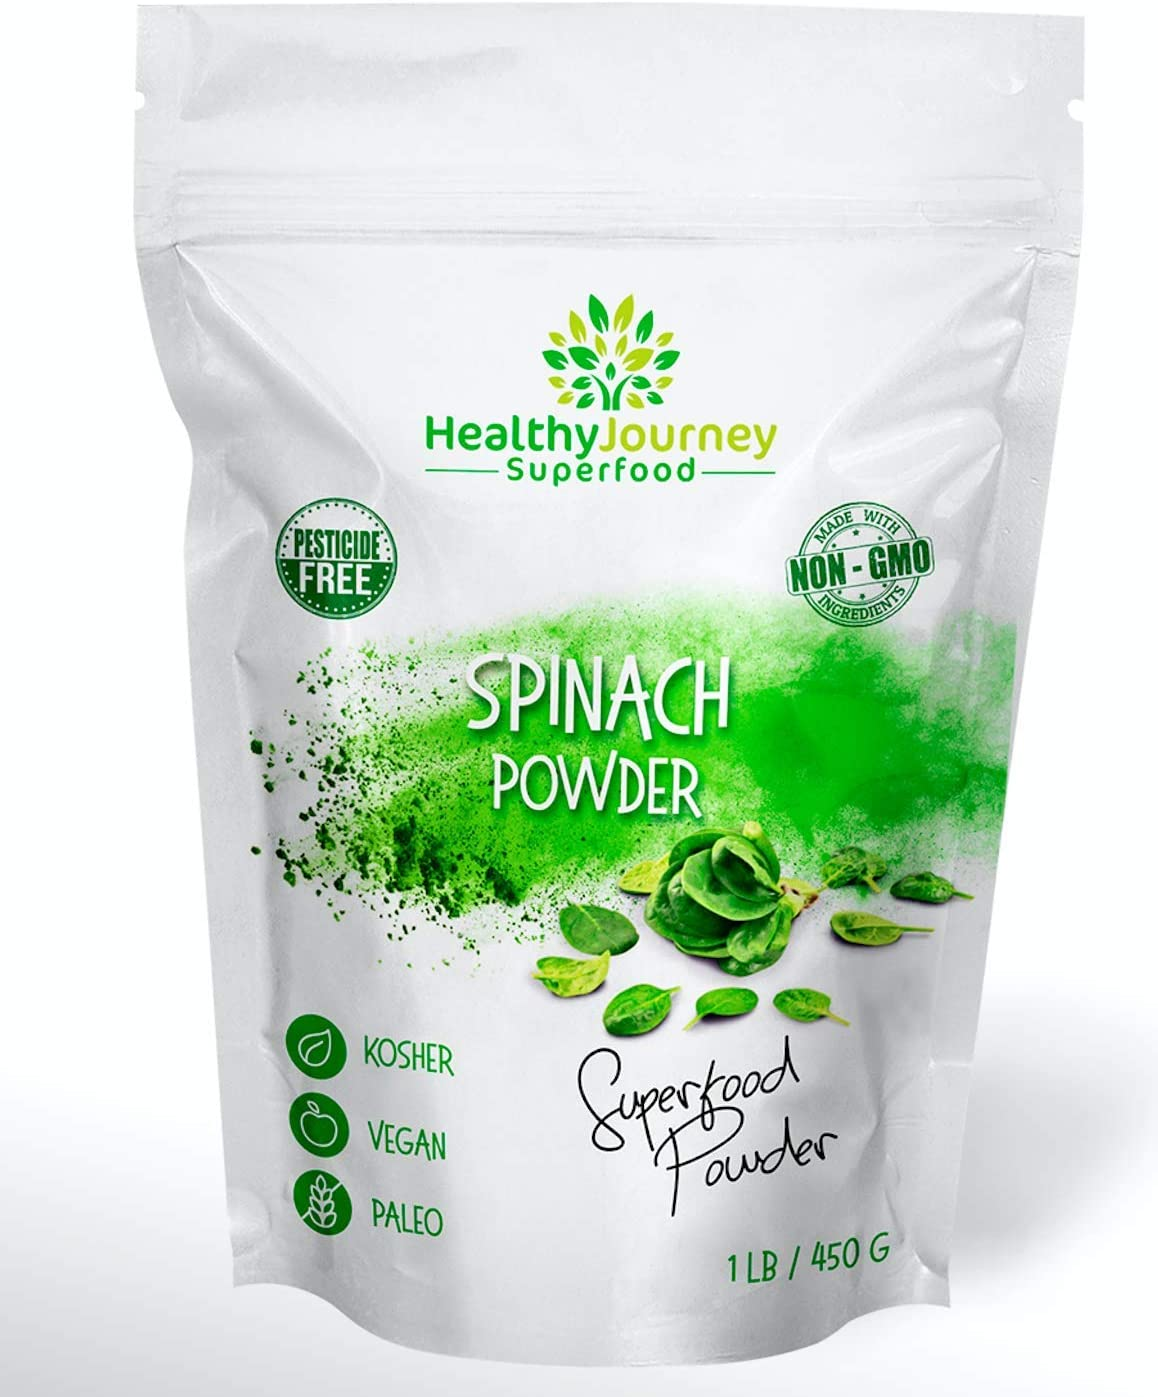 HealthyJourney Superfood - Spinach Powder - 100% Pure - Non-GMO - Pesticide Free - Vegan - Gluten Free - Kosher - Rich in Vitamin C and K - 1 LB